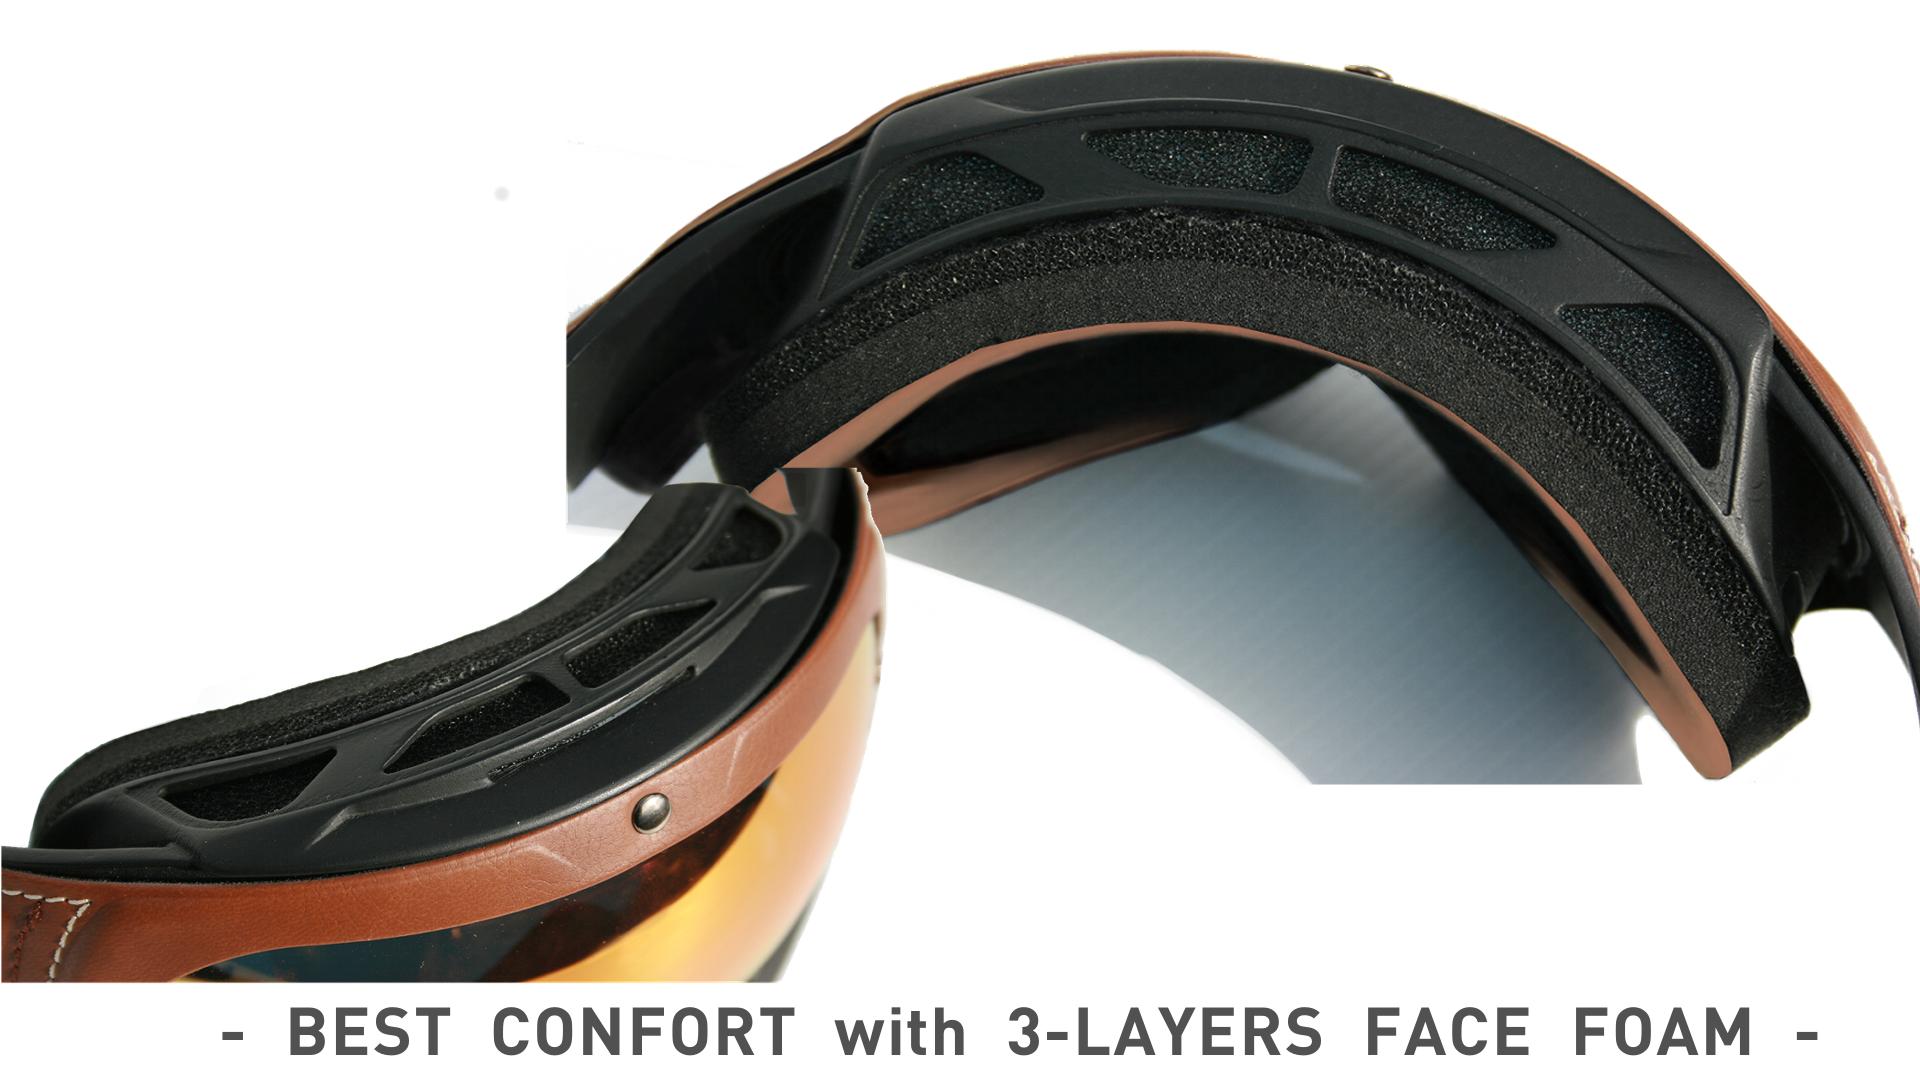 ALZELA-Goggles-3 LAYERS SOFT